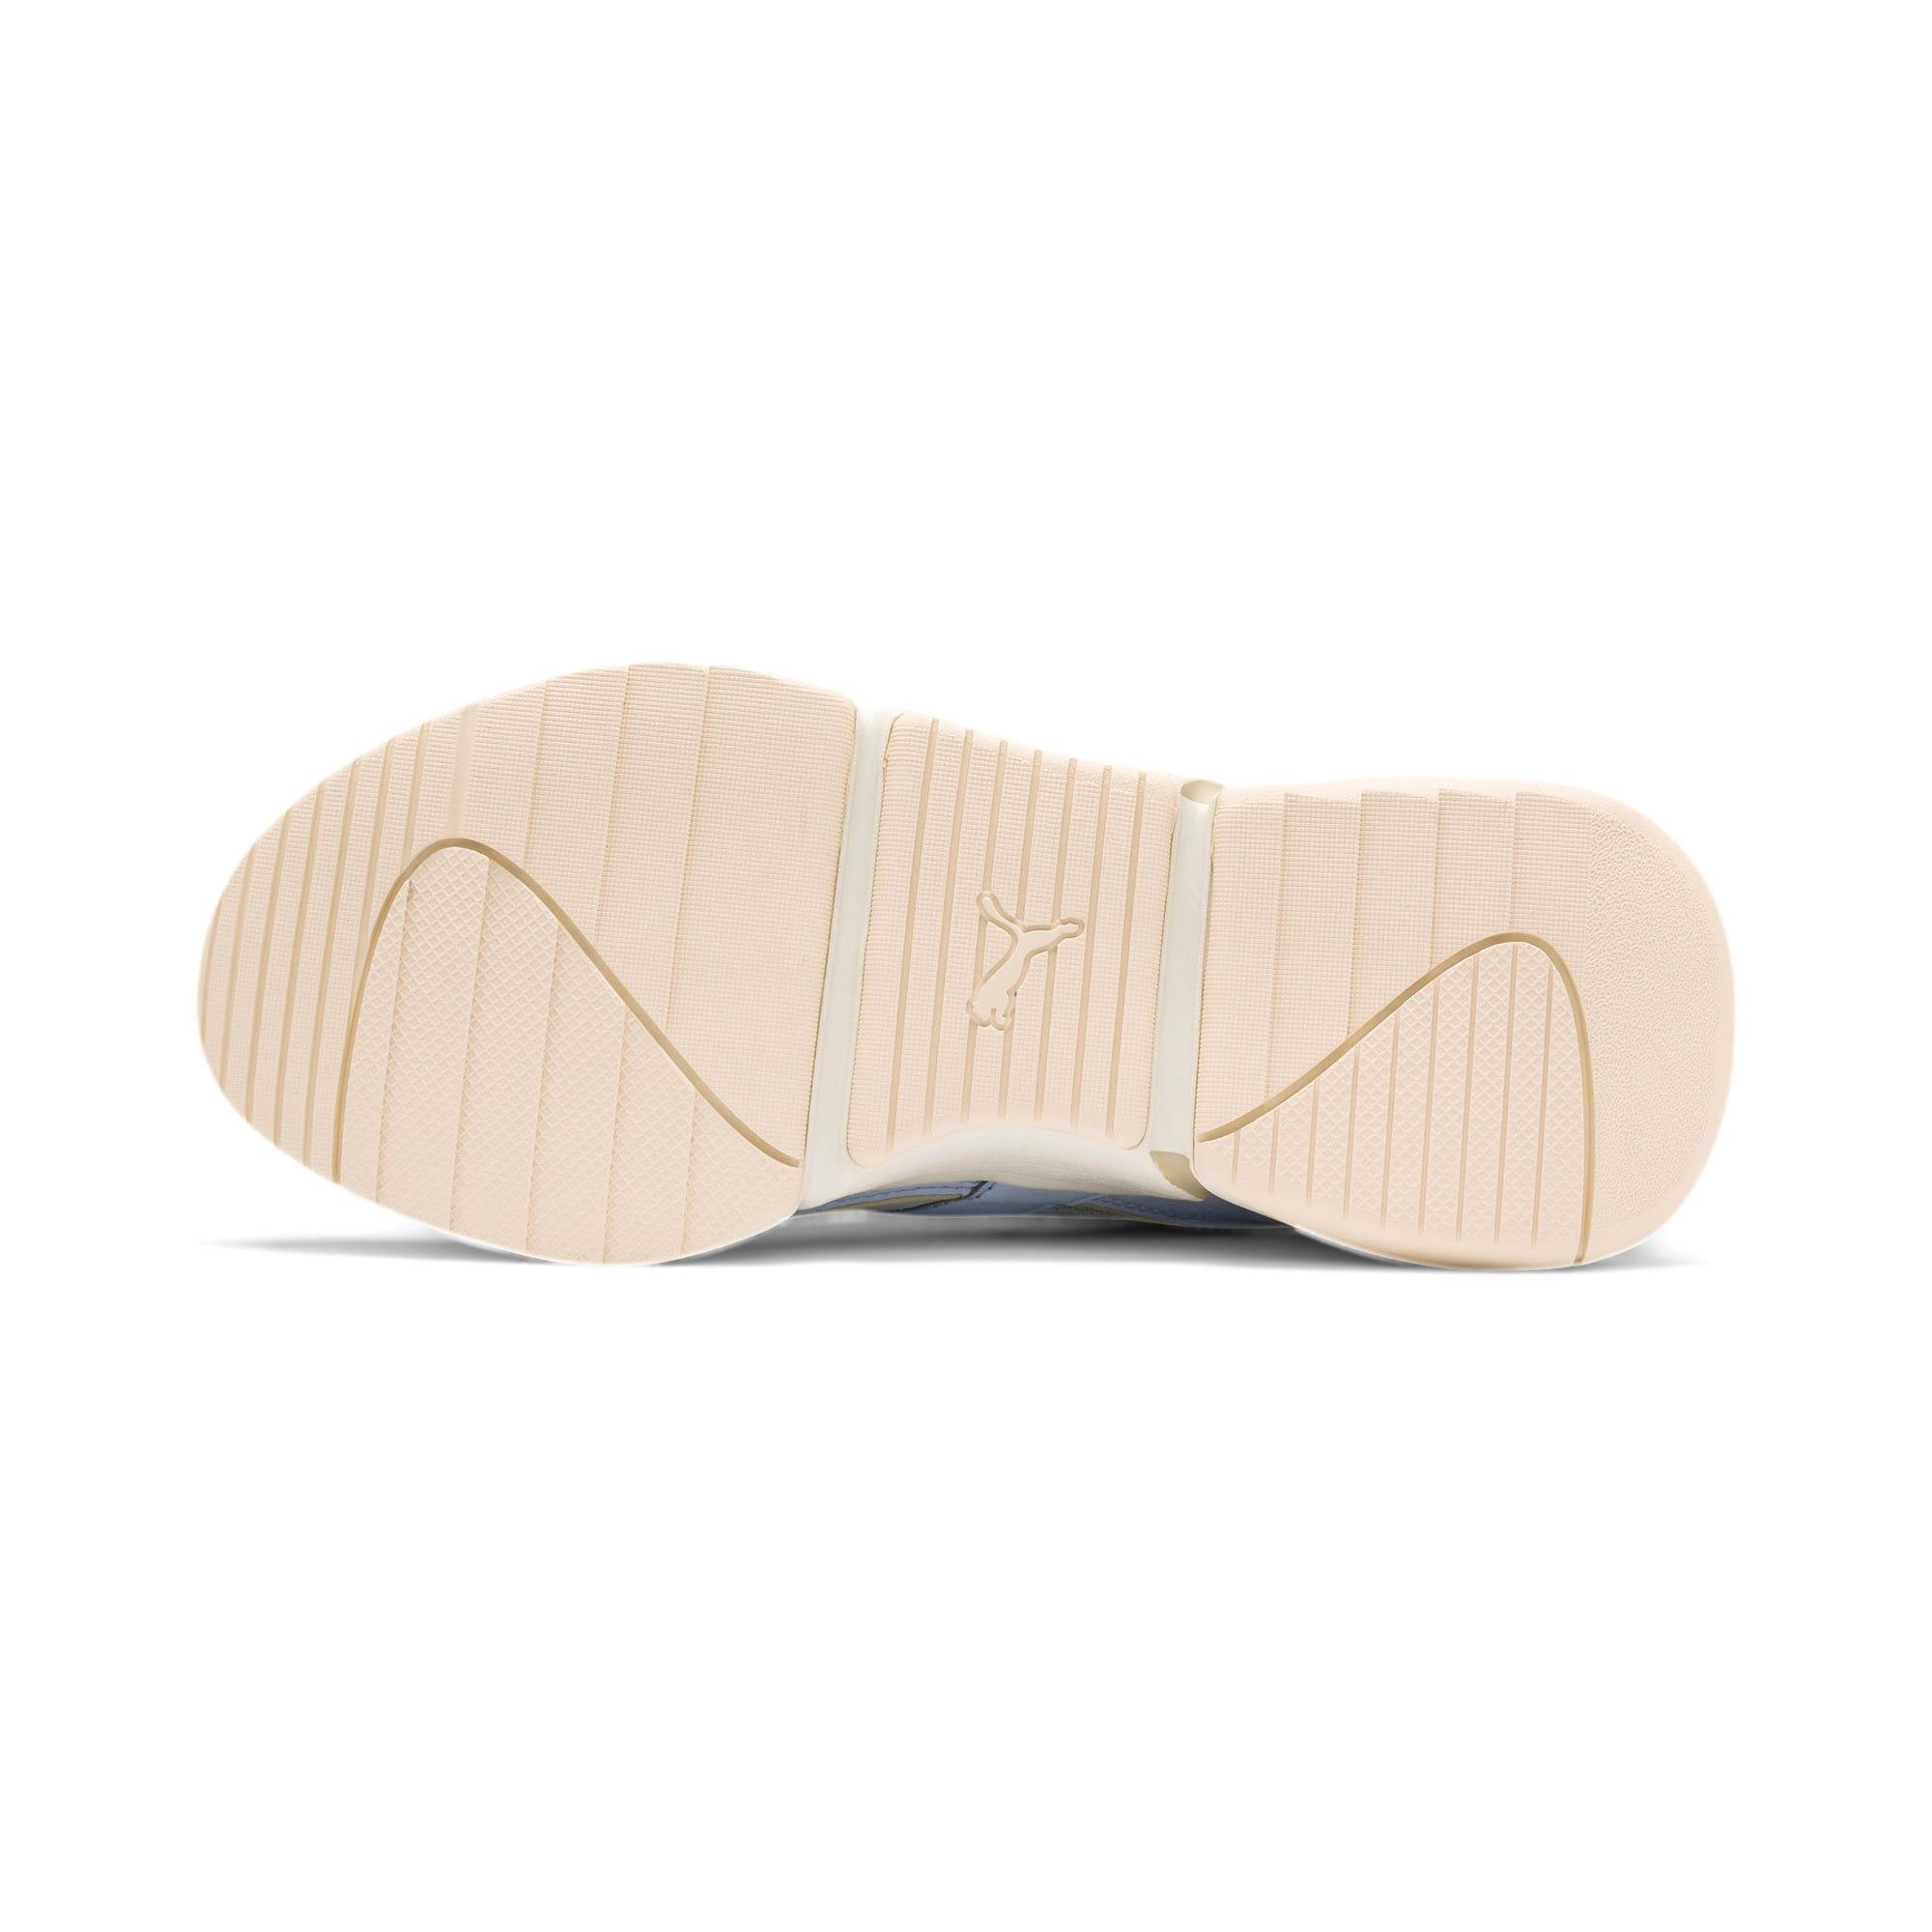 Thumbnail 5 of Nova 2 Suede Women's Sneakers, Heather-Whisper White, medium